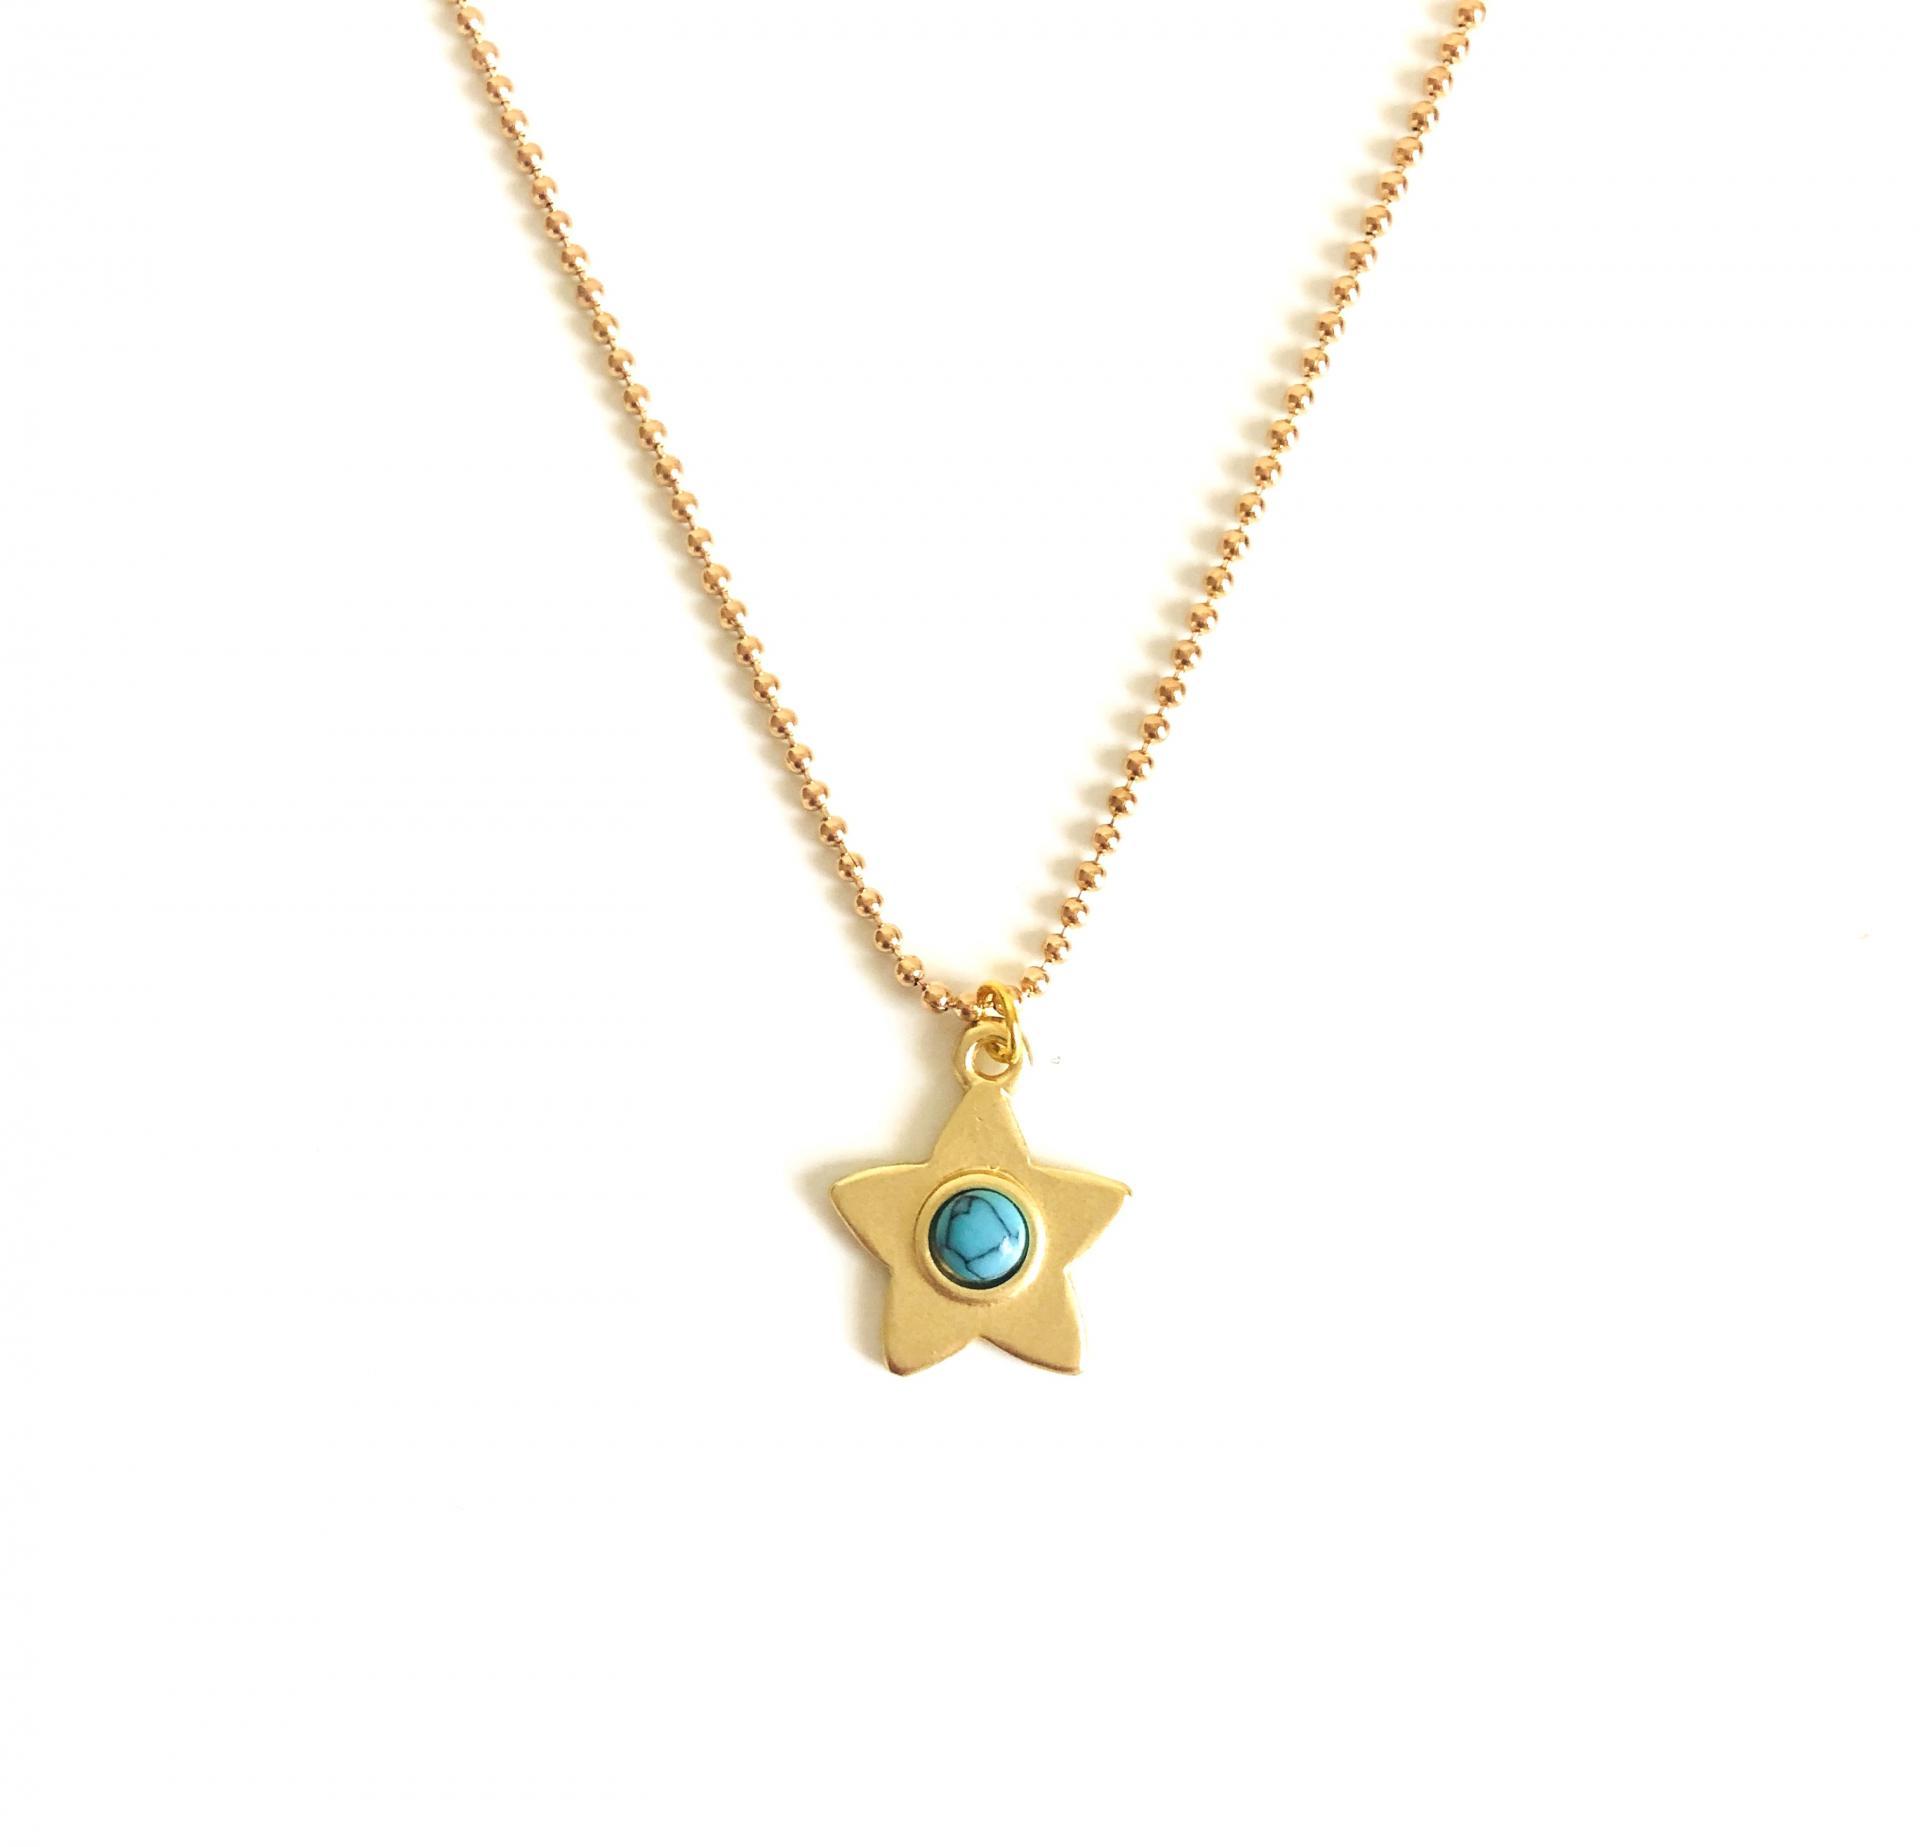 Colgante  estrella dorada con turquesa